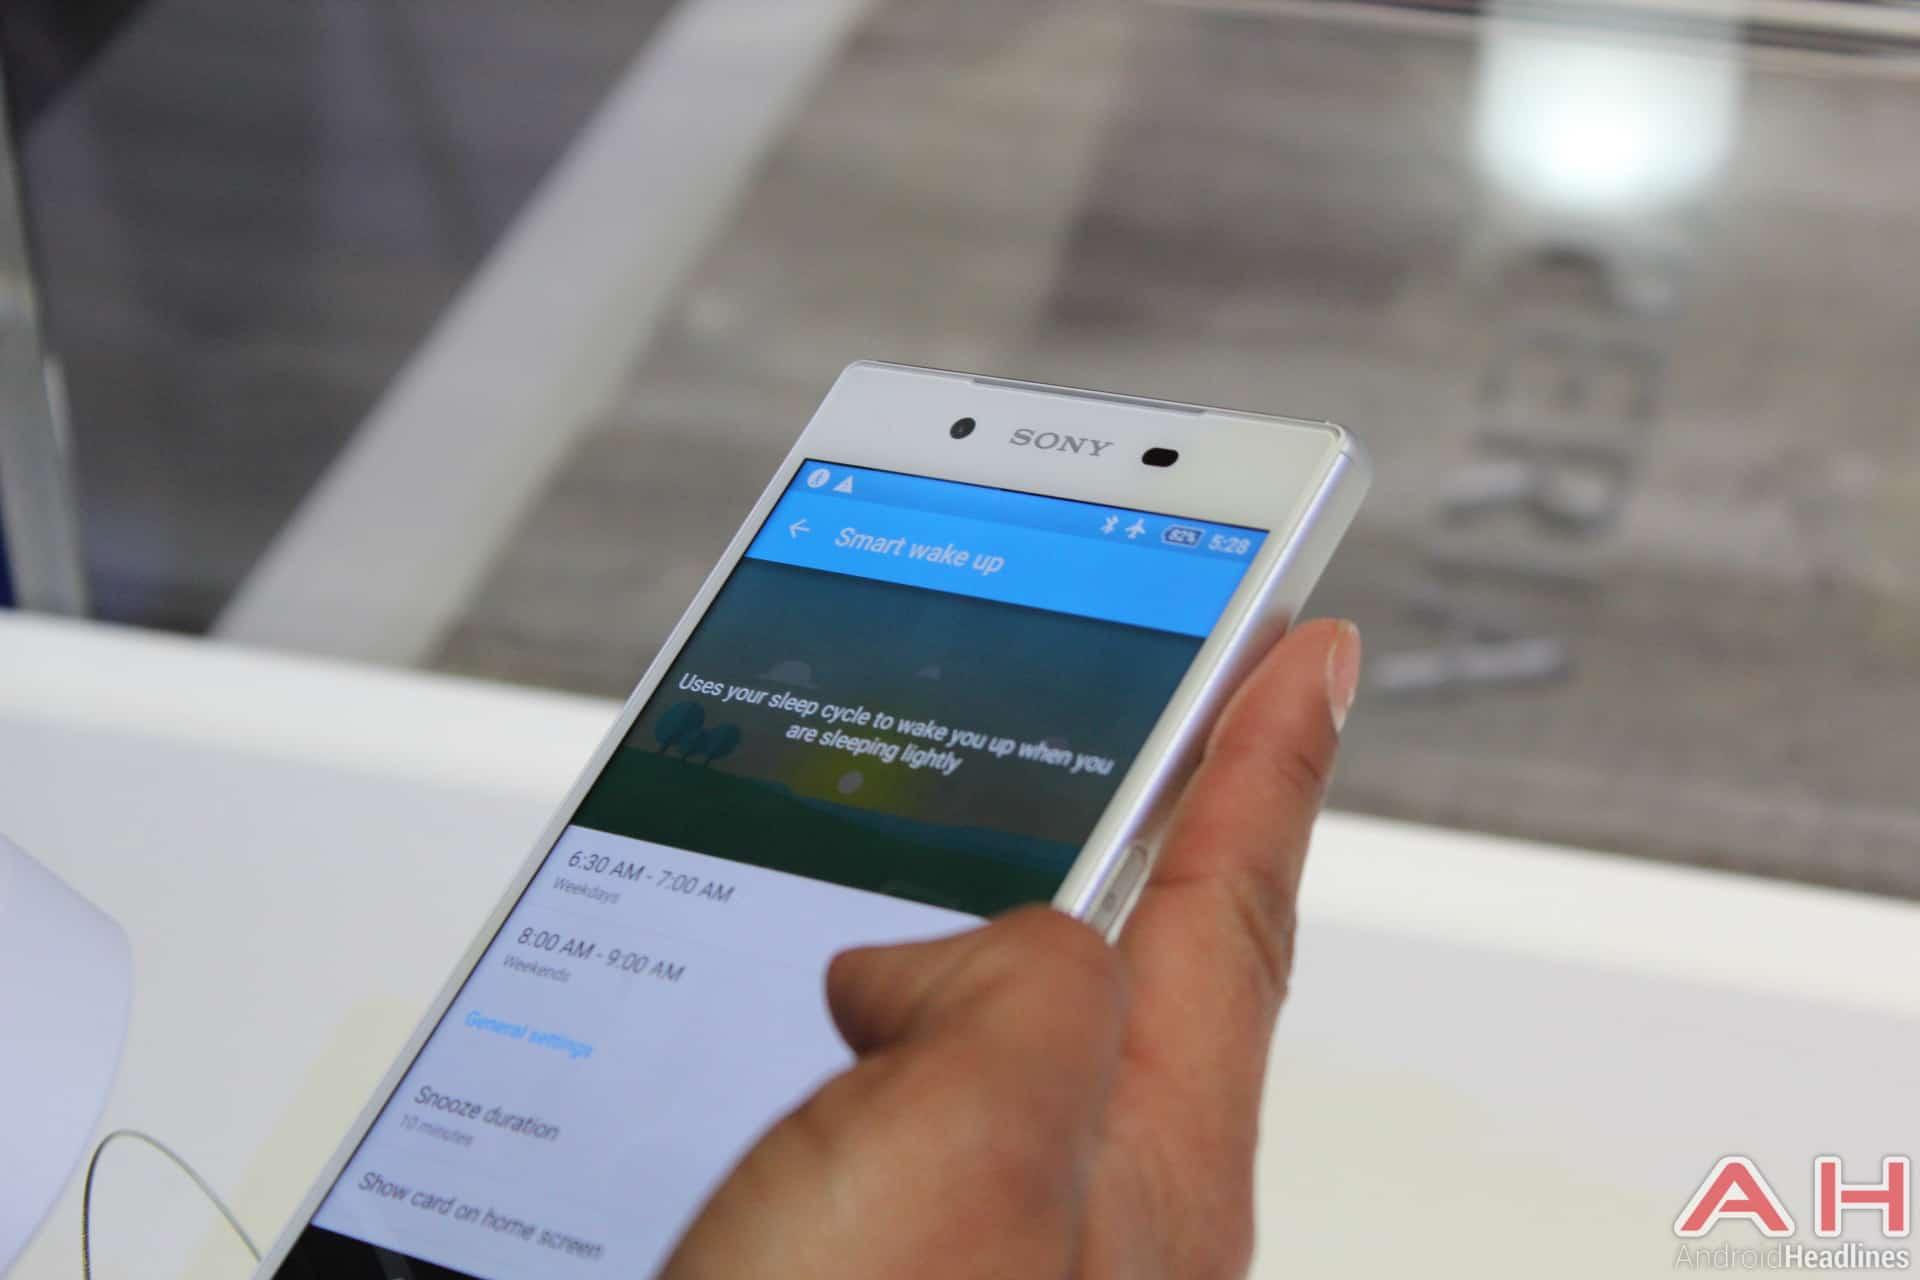 Sony Xperia Z5 IFA AH 4